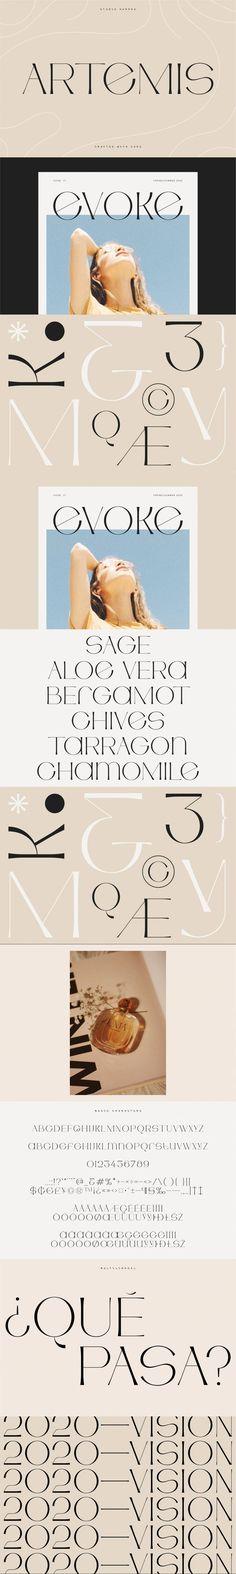 Artemis – Semi-serif Unique Typeface #modern #WeddingDesign #opentype #multilingualfont #artemis #fashiontypography #quote #studioaurora #decorative #opentypefont #LetteringFont #portfolio #font #uniquefont #socialmedia #weddingfont #summer #VintageFonts #minimalfont